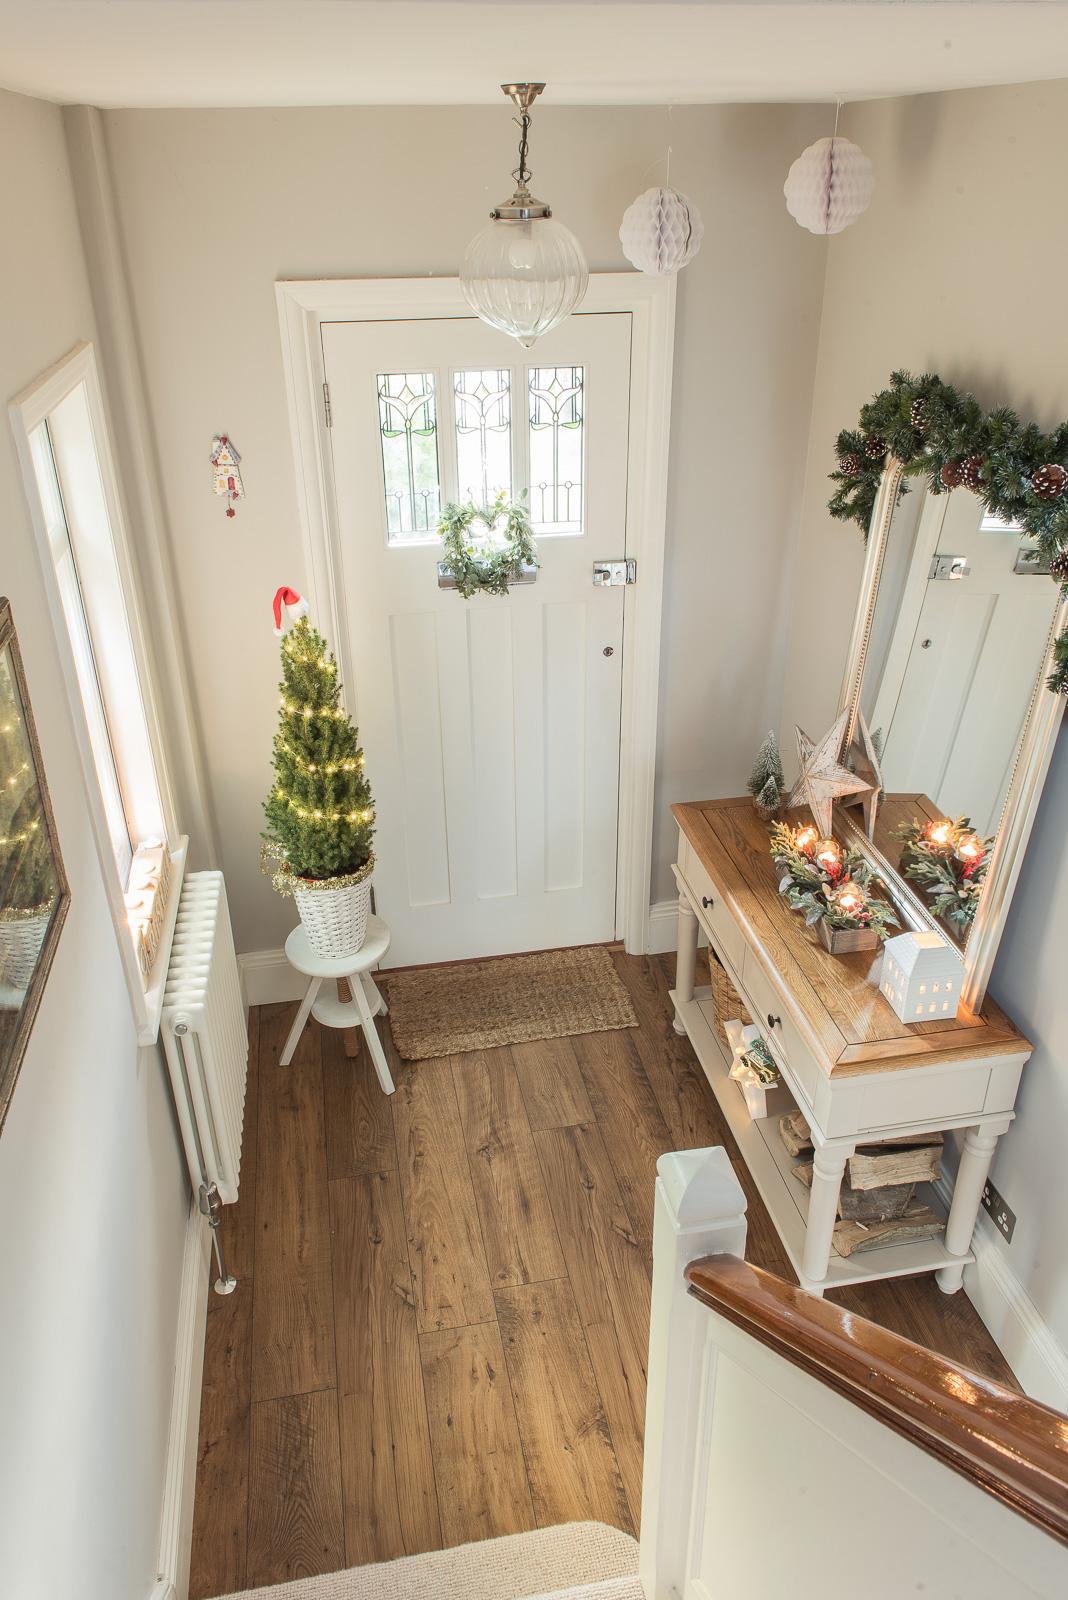 Festive hallway style